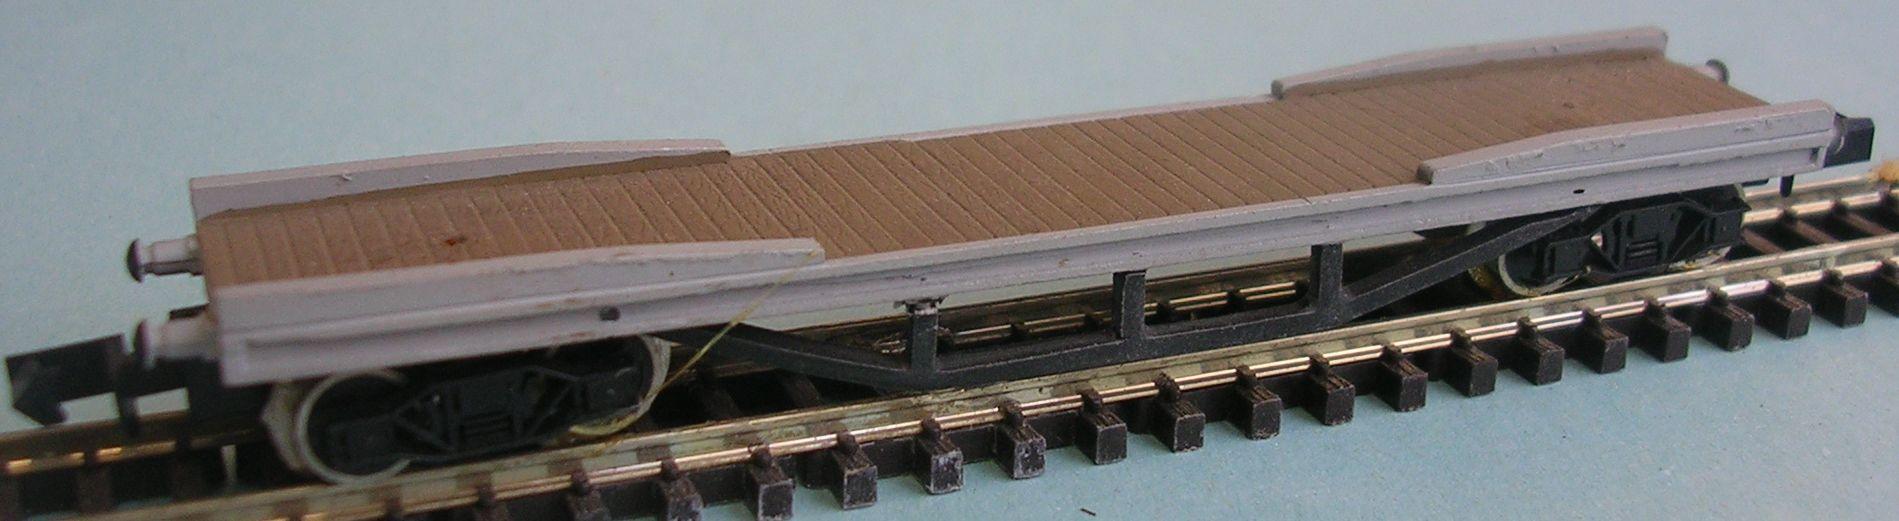 NW27 Bo-Rail Car Transport